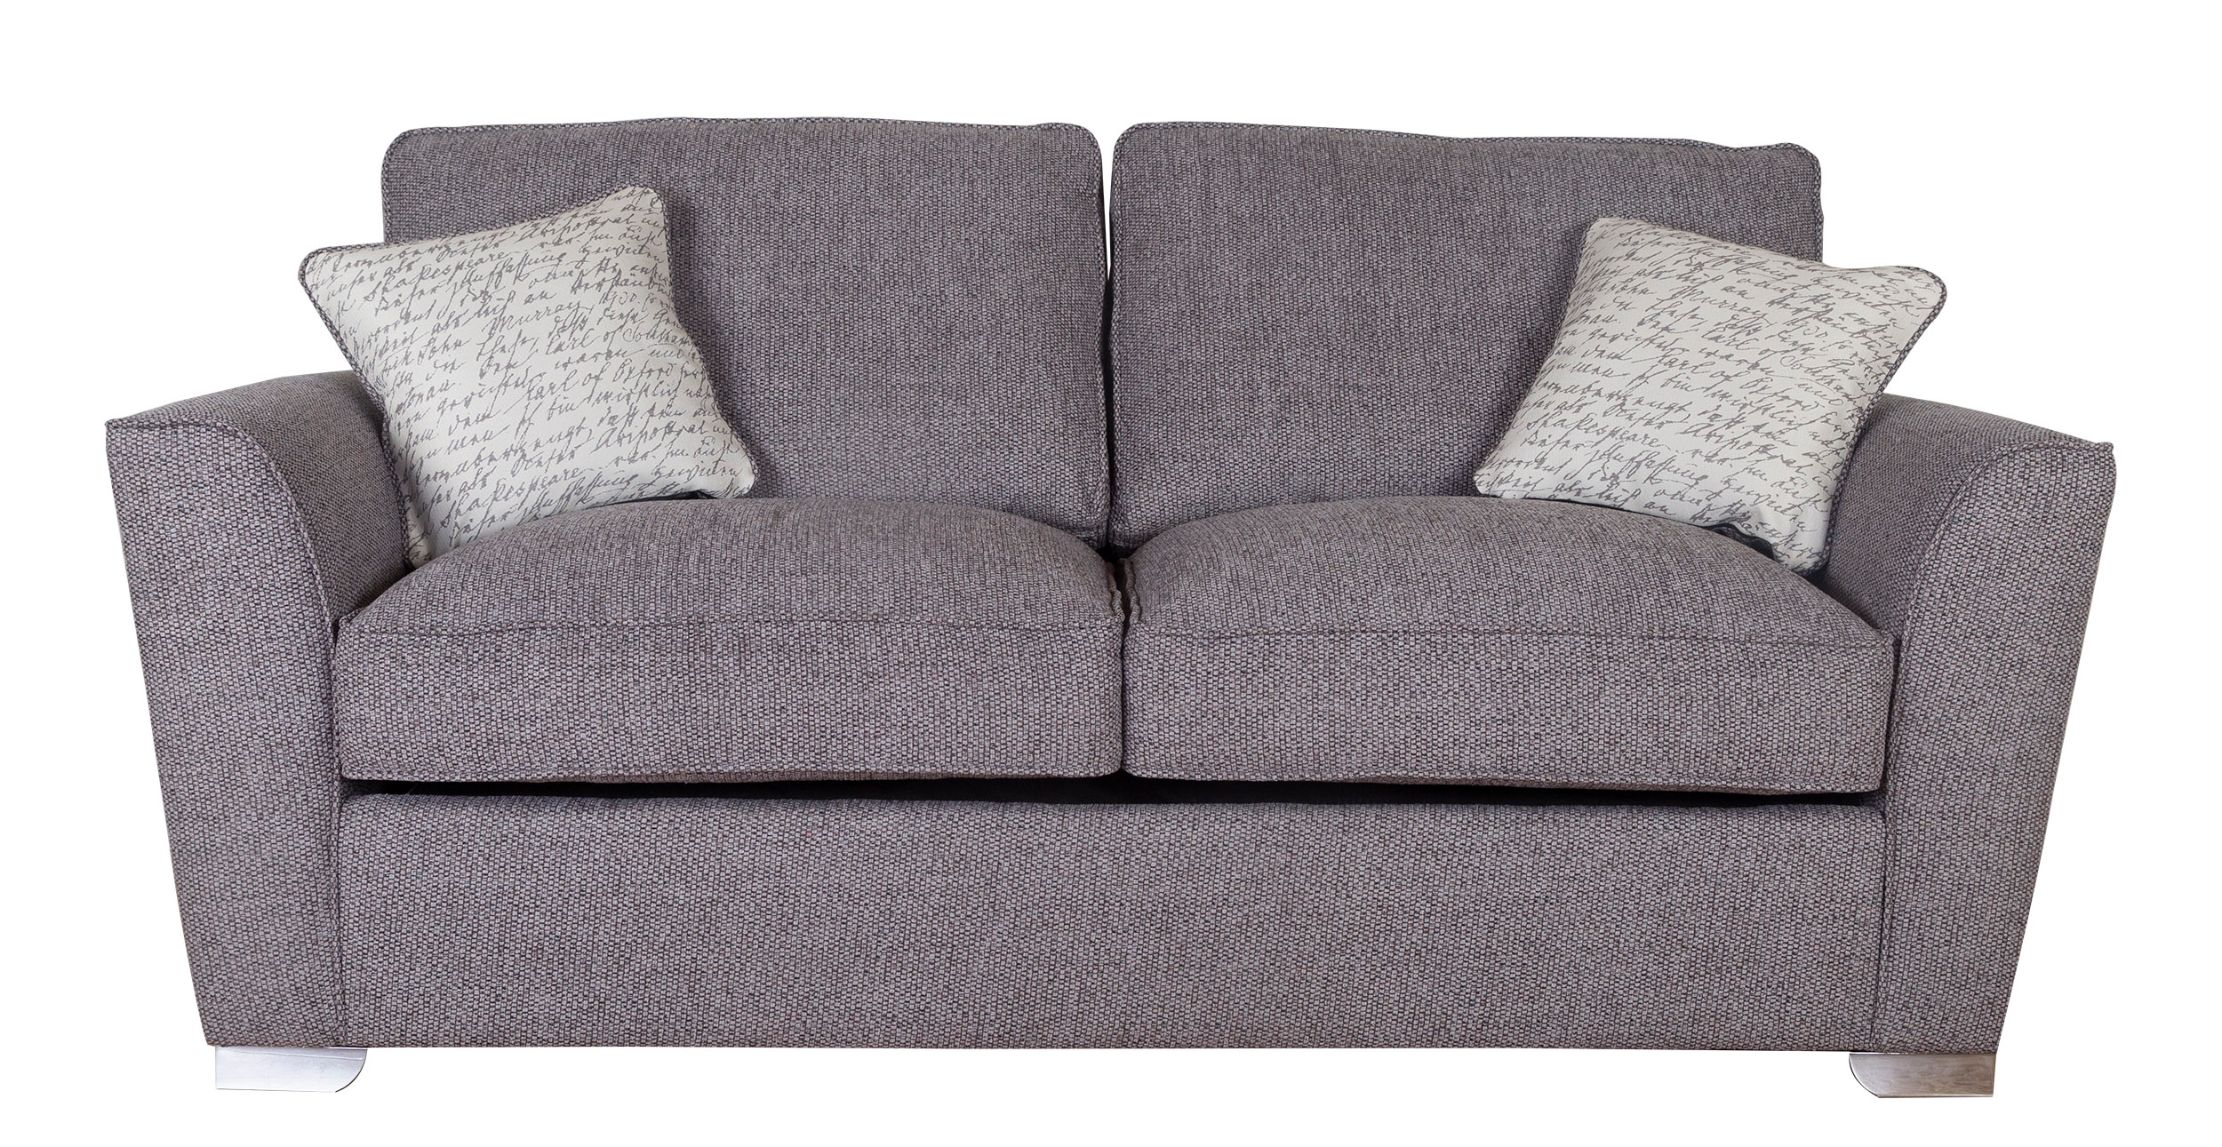 Fantasy 4 Seater Sofa - Standard Back